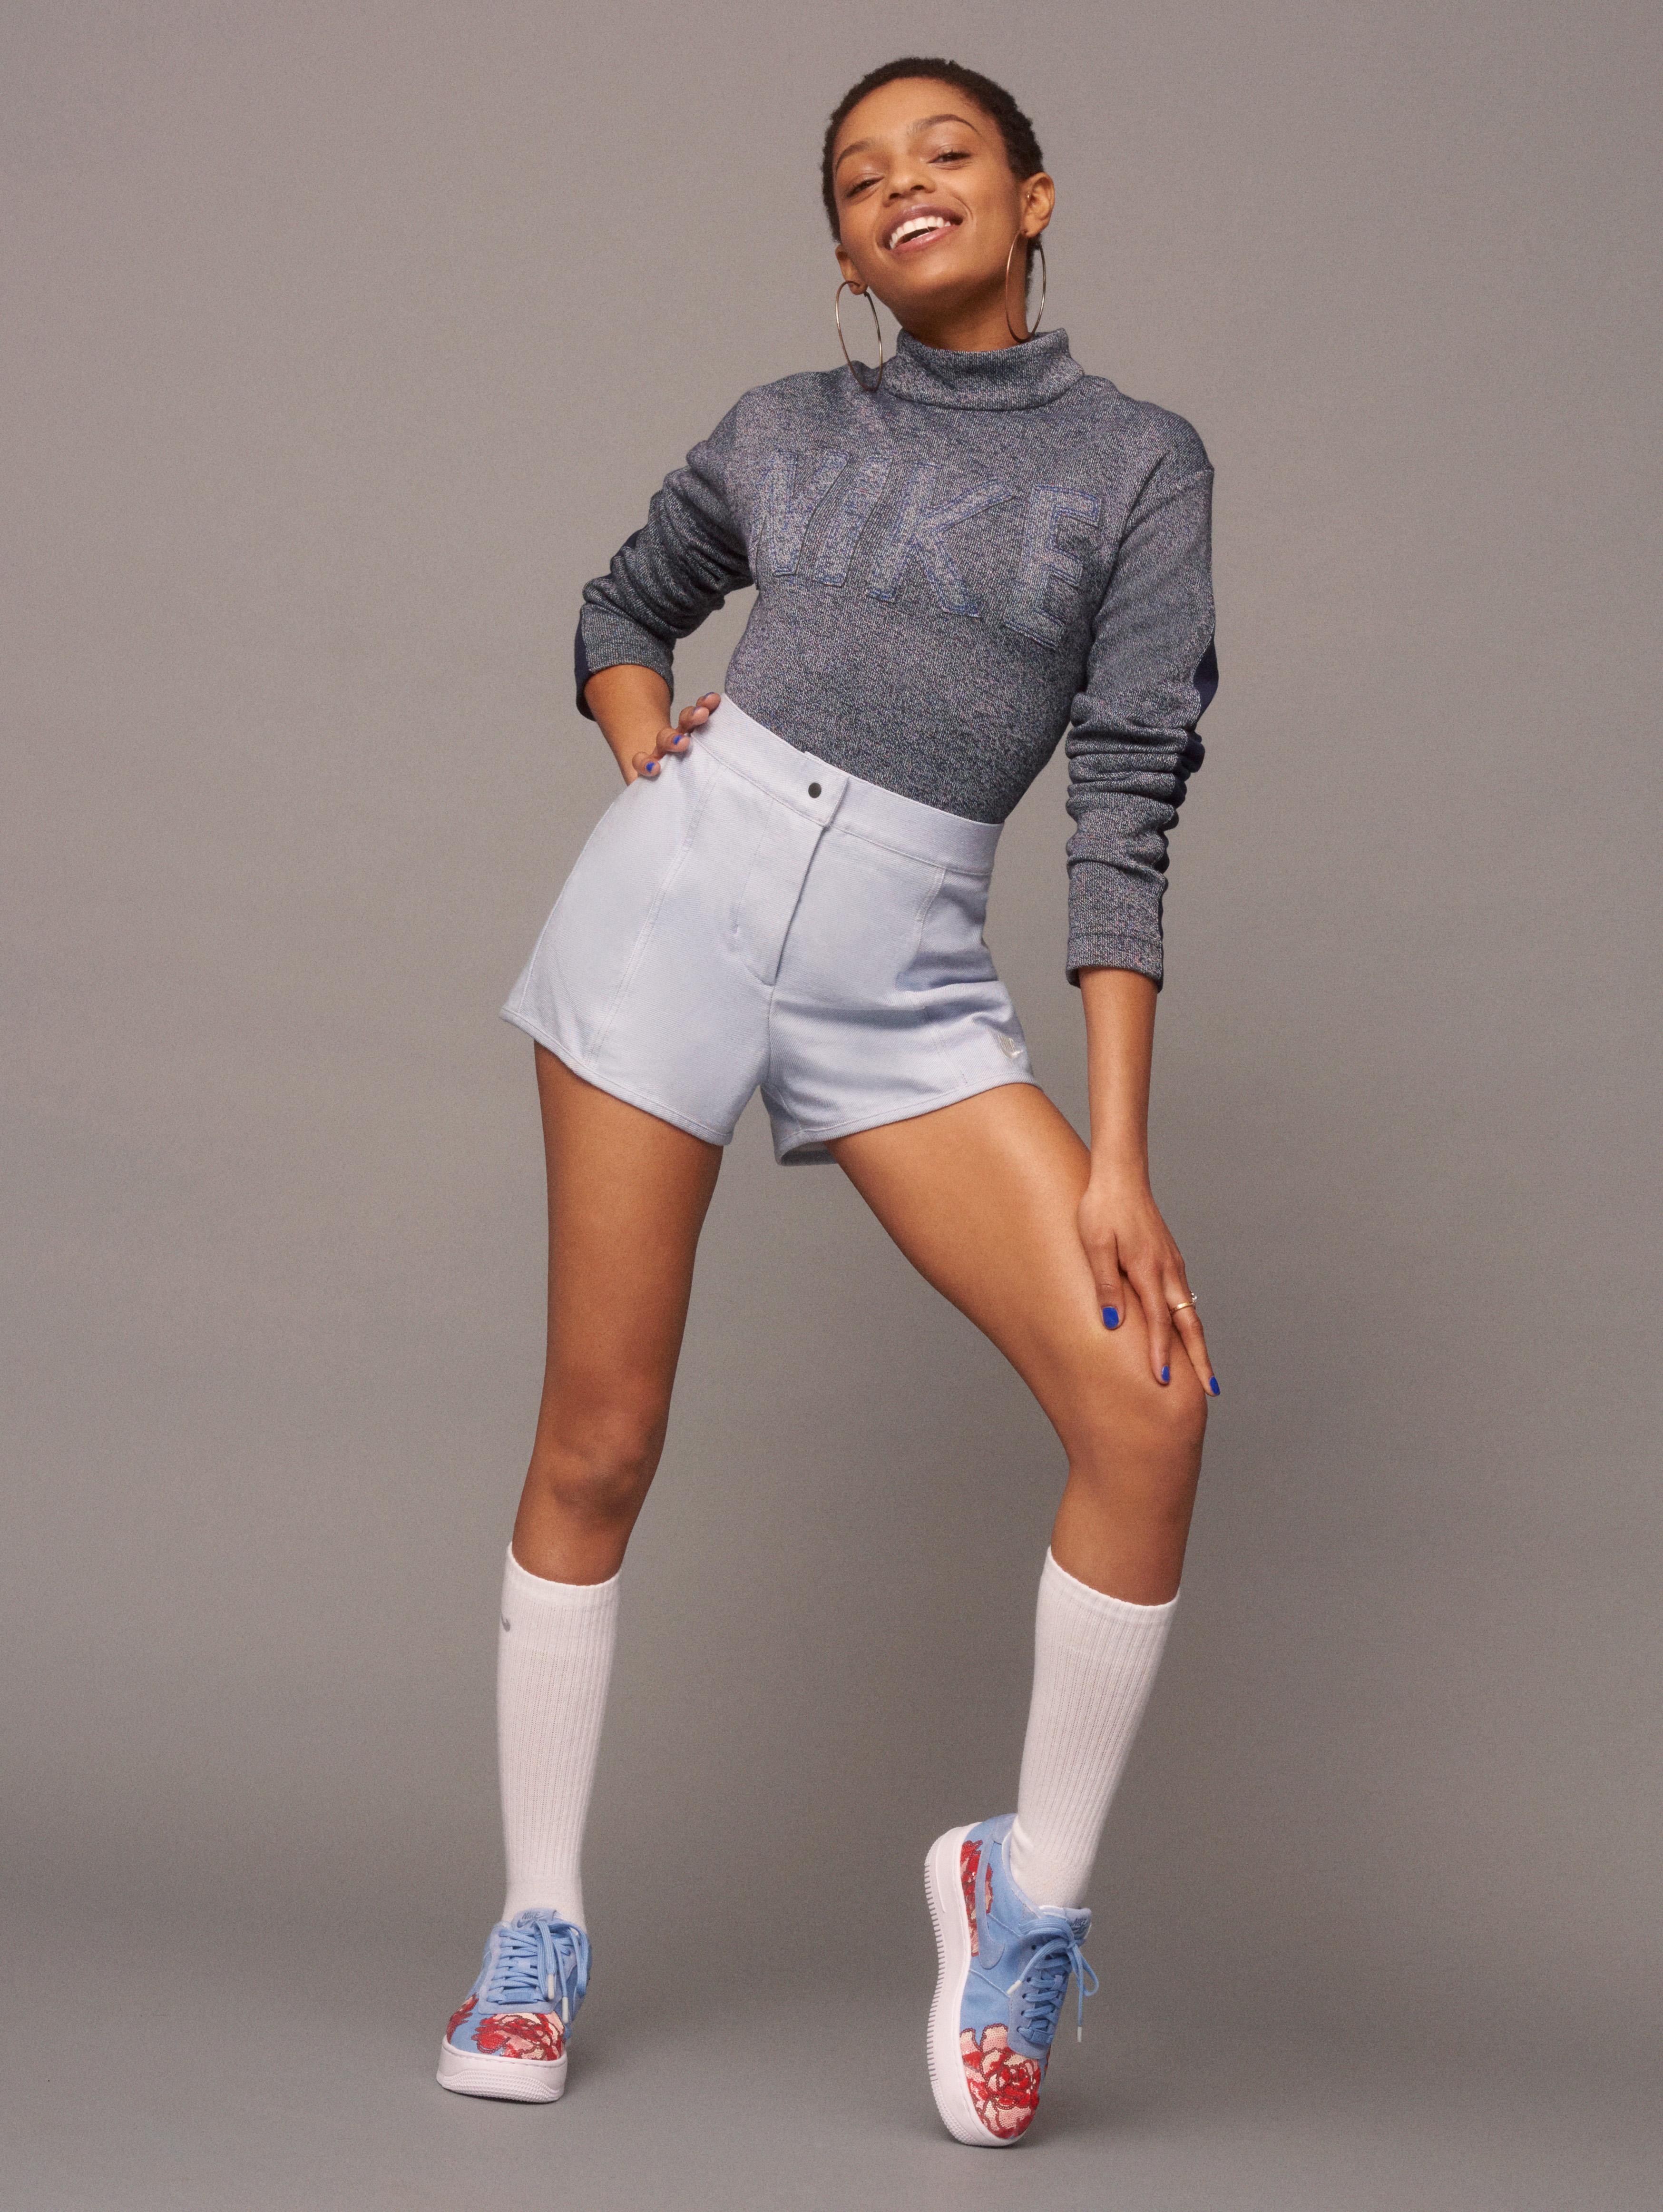 NikeWomen FA 17 Collection Look 15